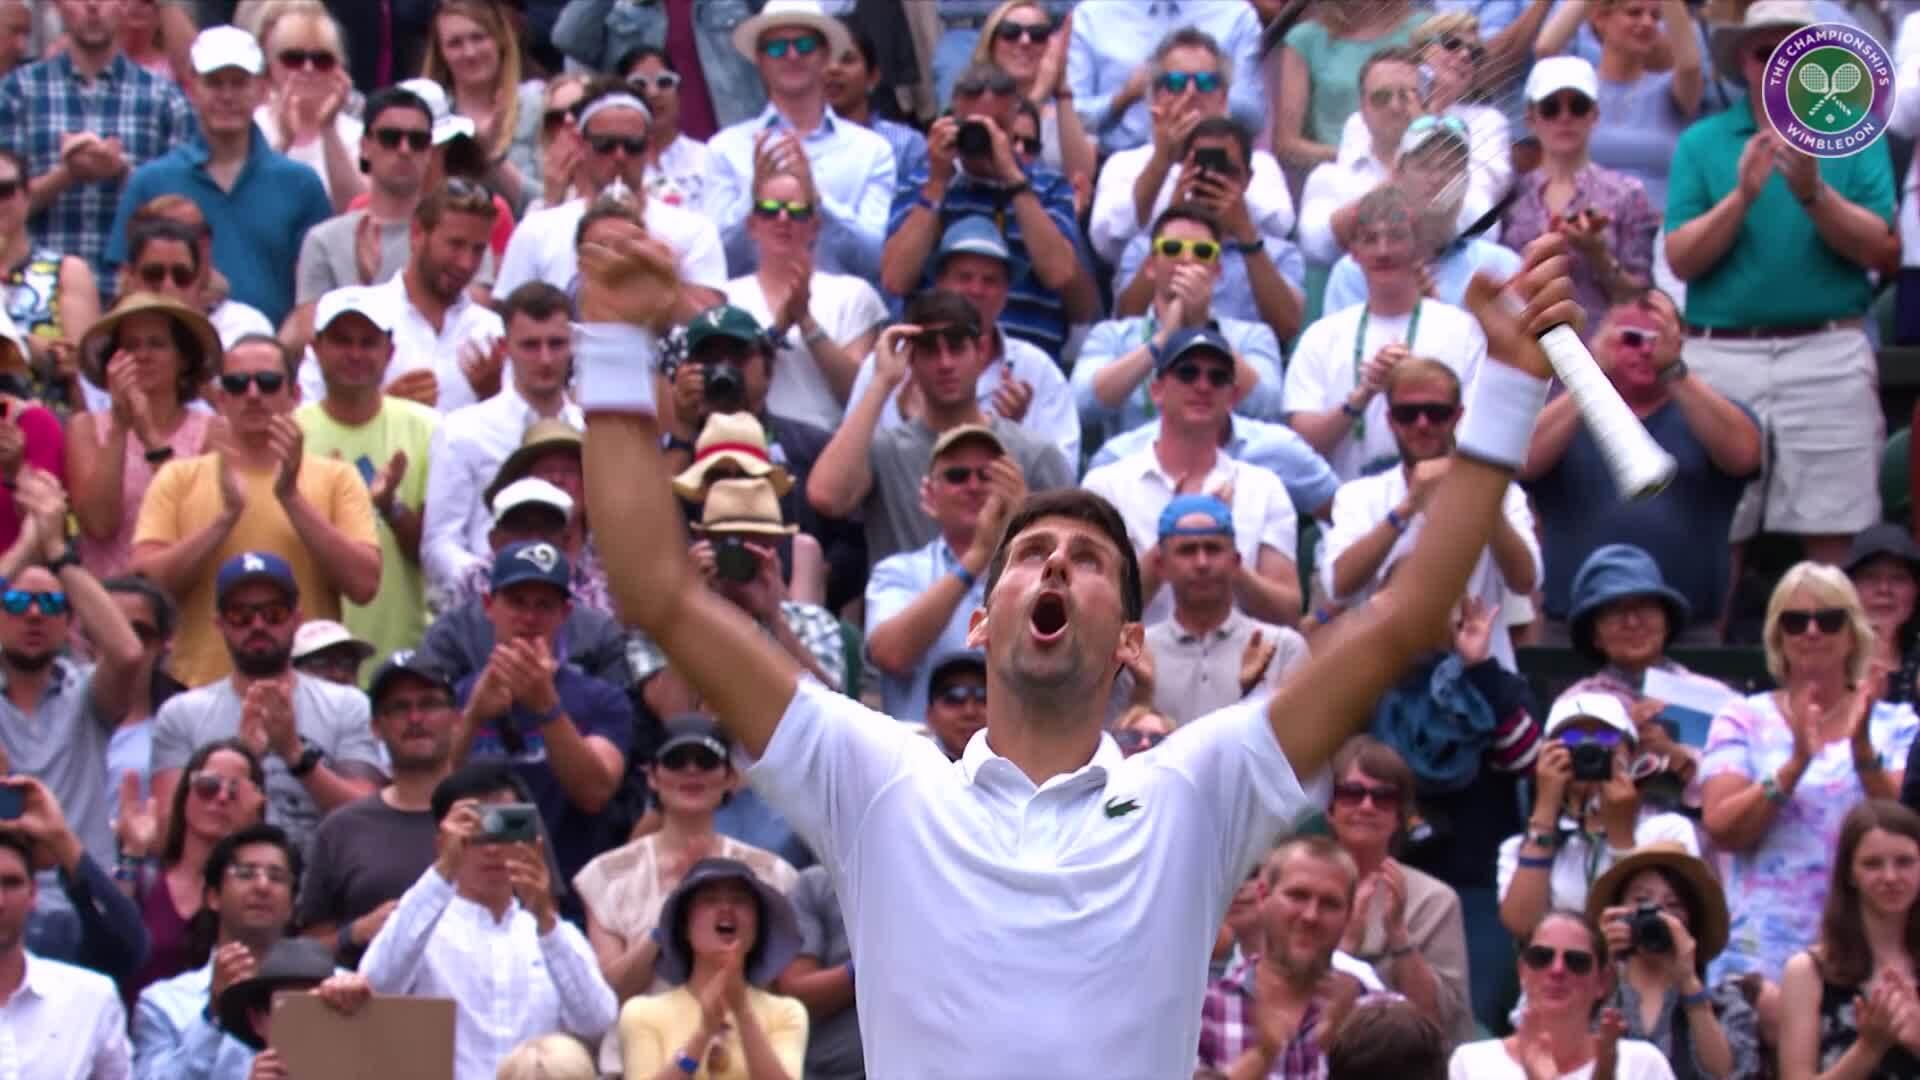 Wimbledon results today LIVE: Rafael Nadal vs Roger Federer, Novak Djokovic vs Roberto Bautista Agut